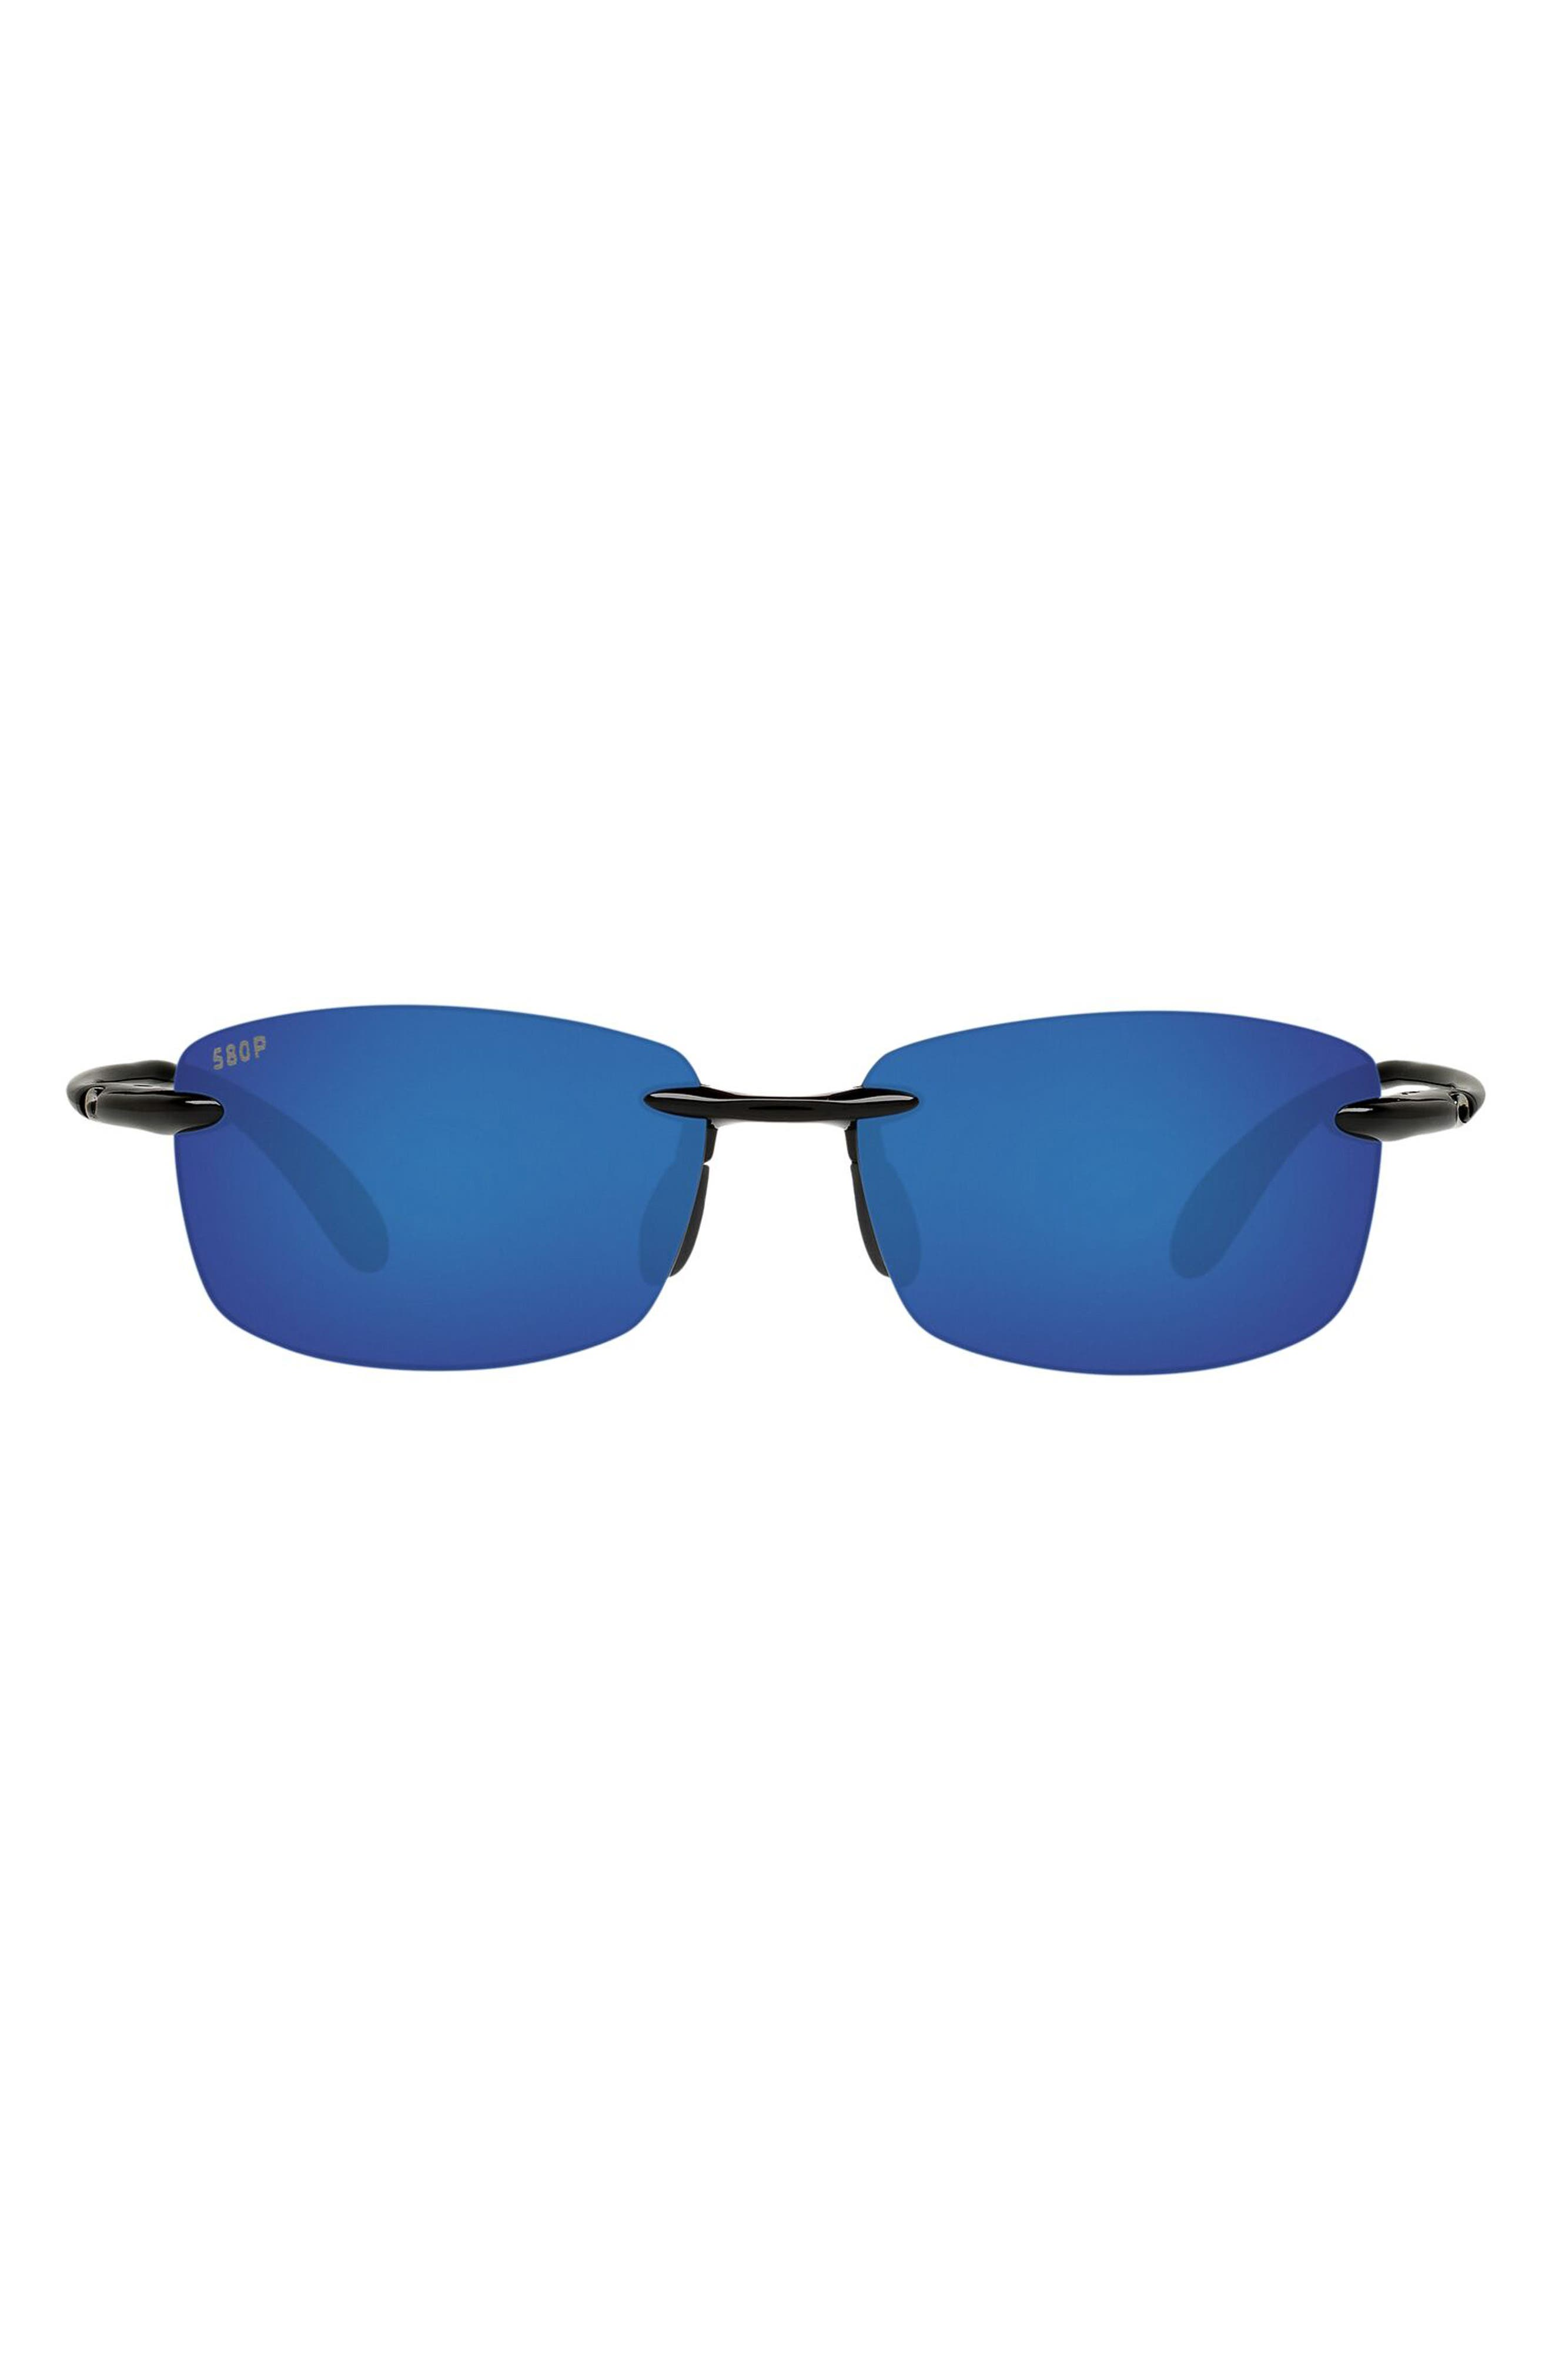 60mm Polarized Sunglasses